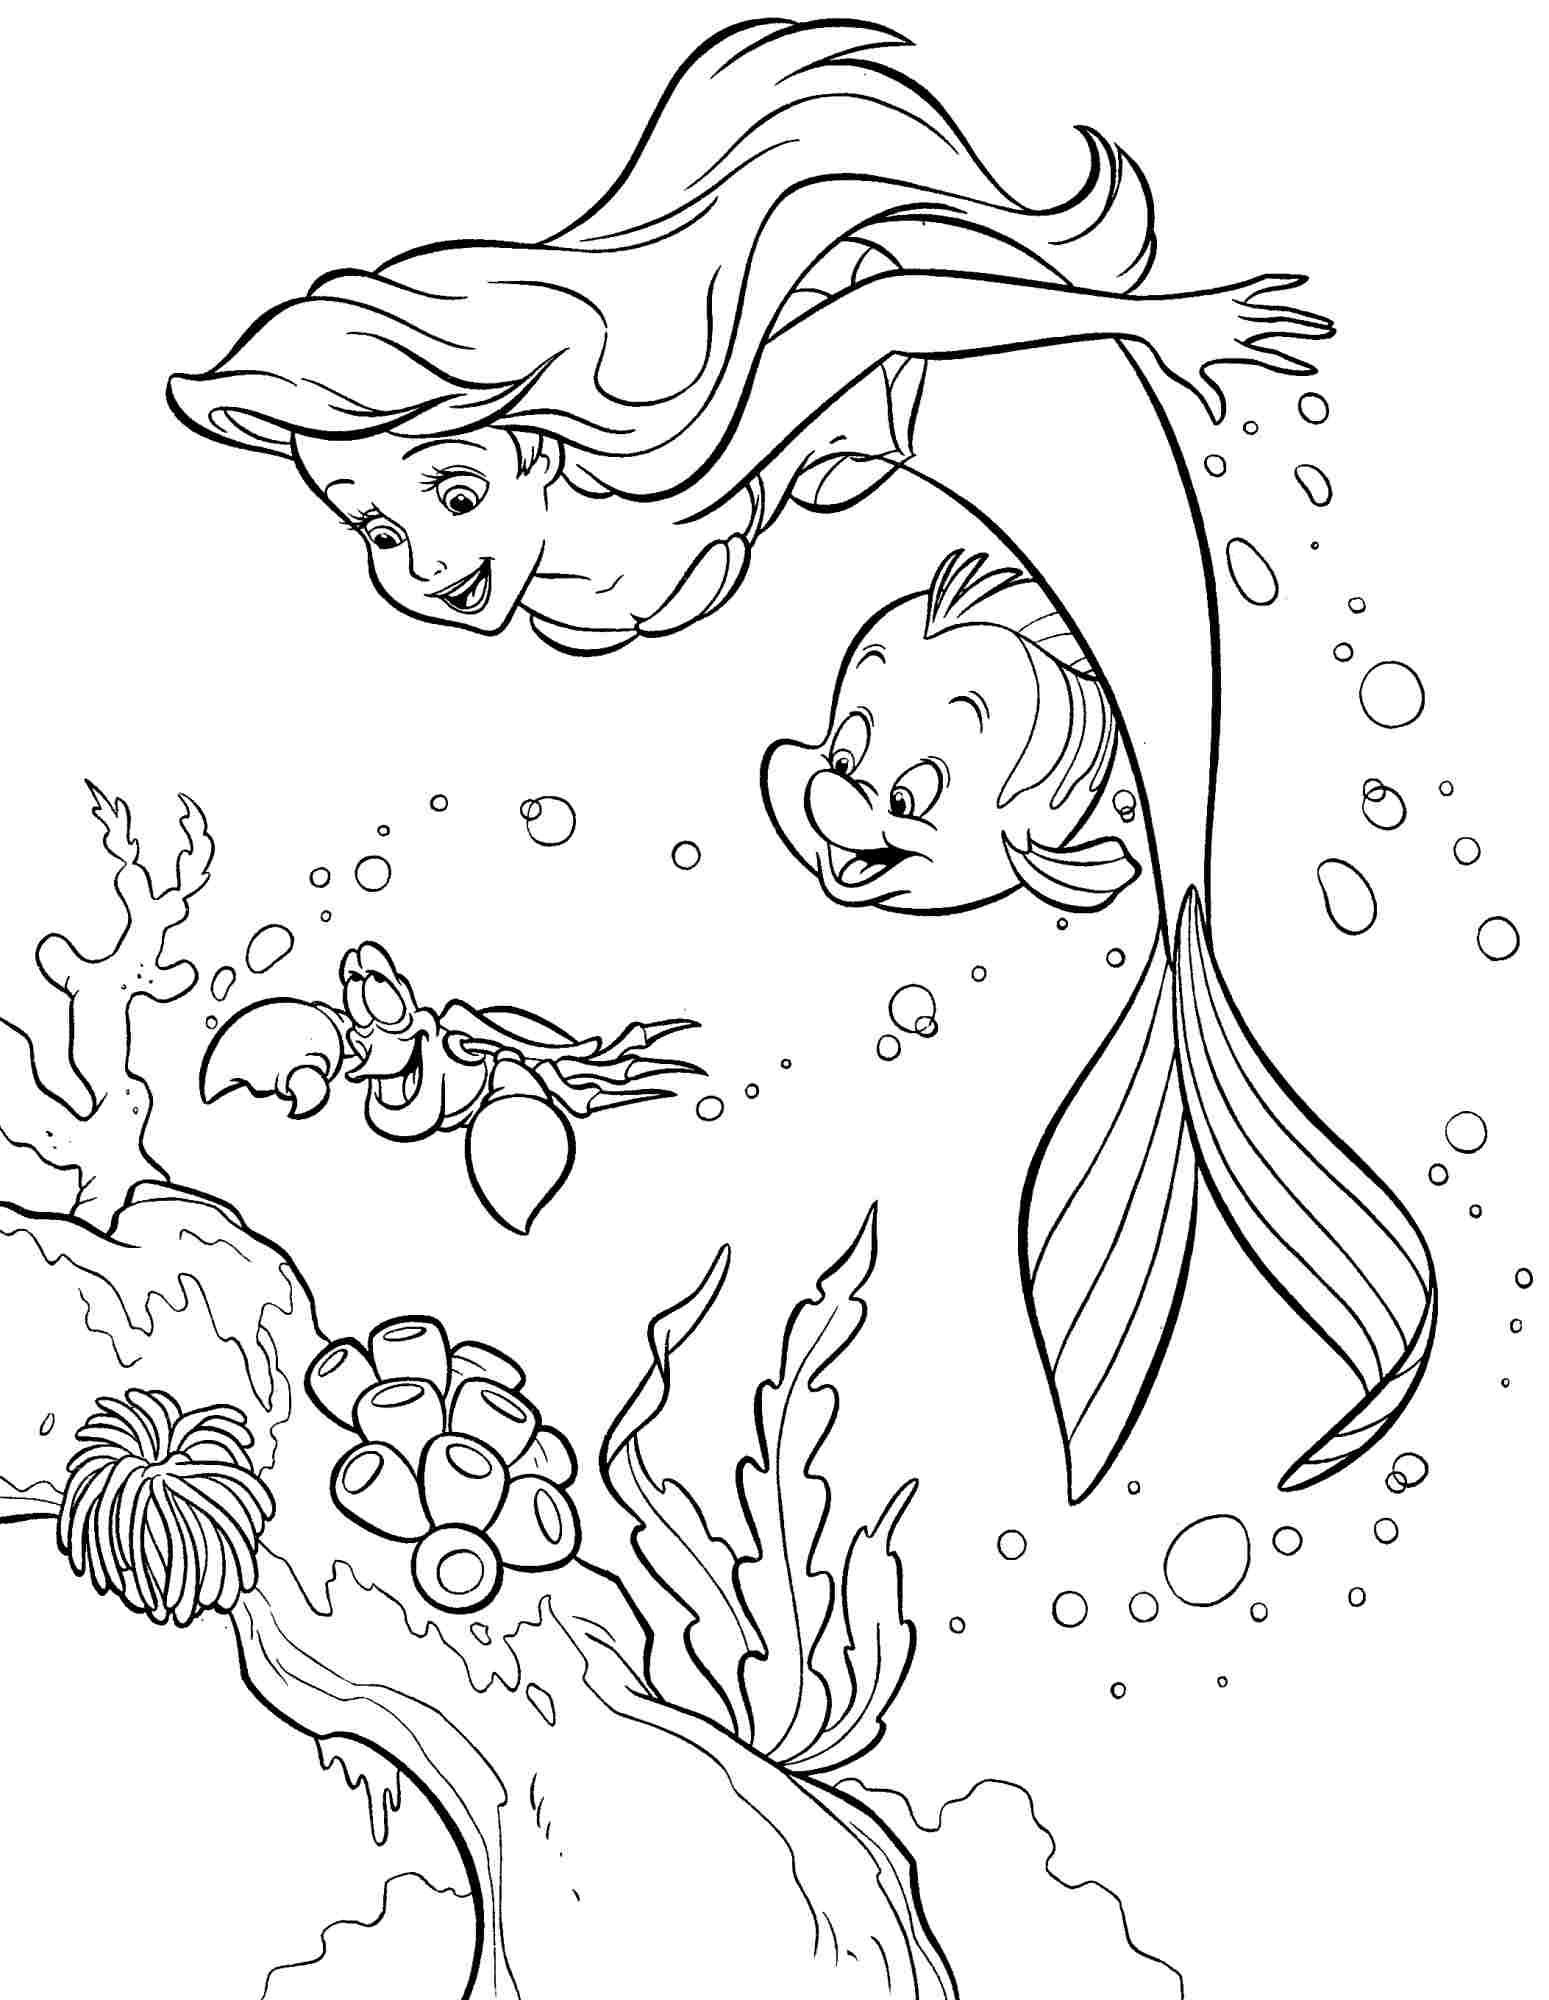 Раскраска девочка русалочка